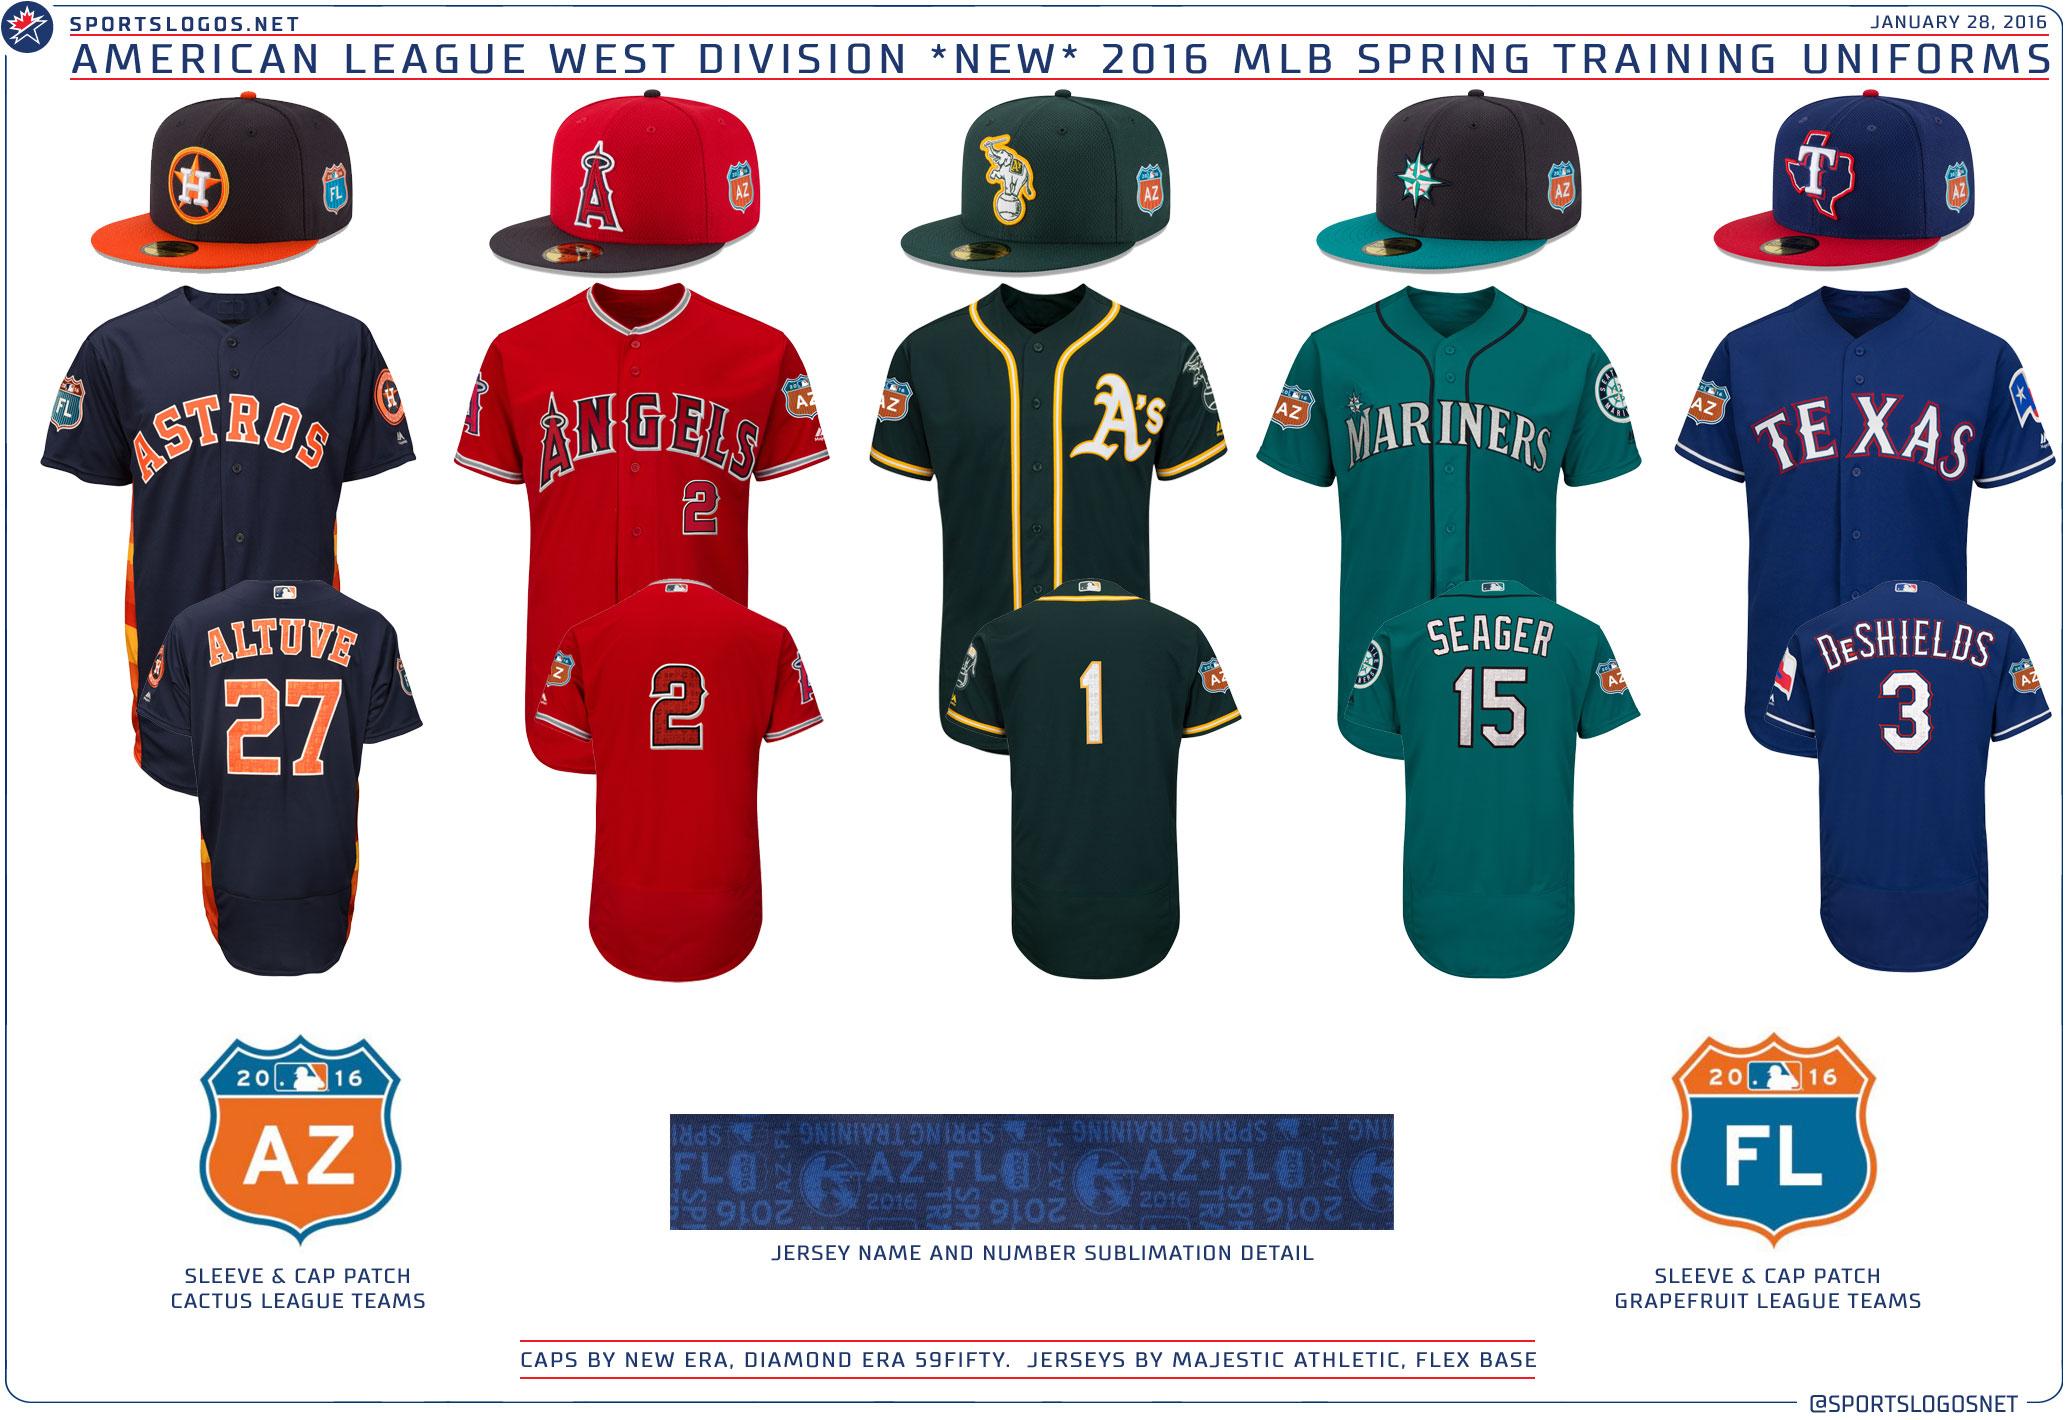 0f844bc5e24 2016 Spring Training Uniforms - AL West Astros Angels Athletics Mariners  Rangers